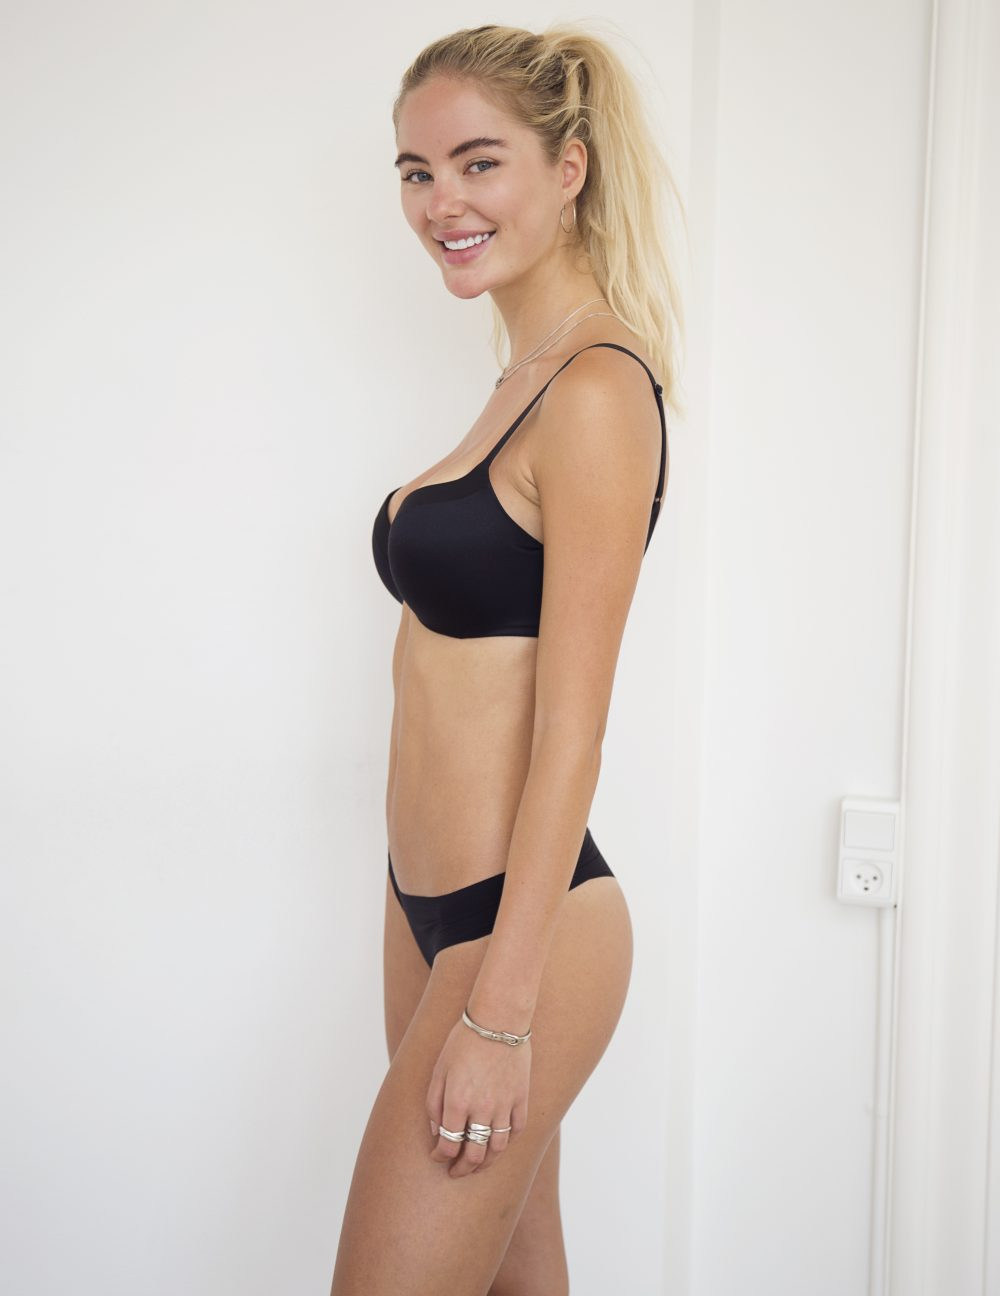 Natasja Madsen Nude Photos 15